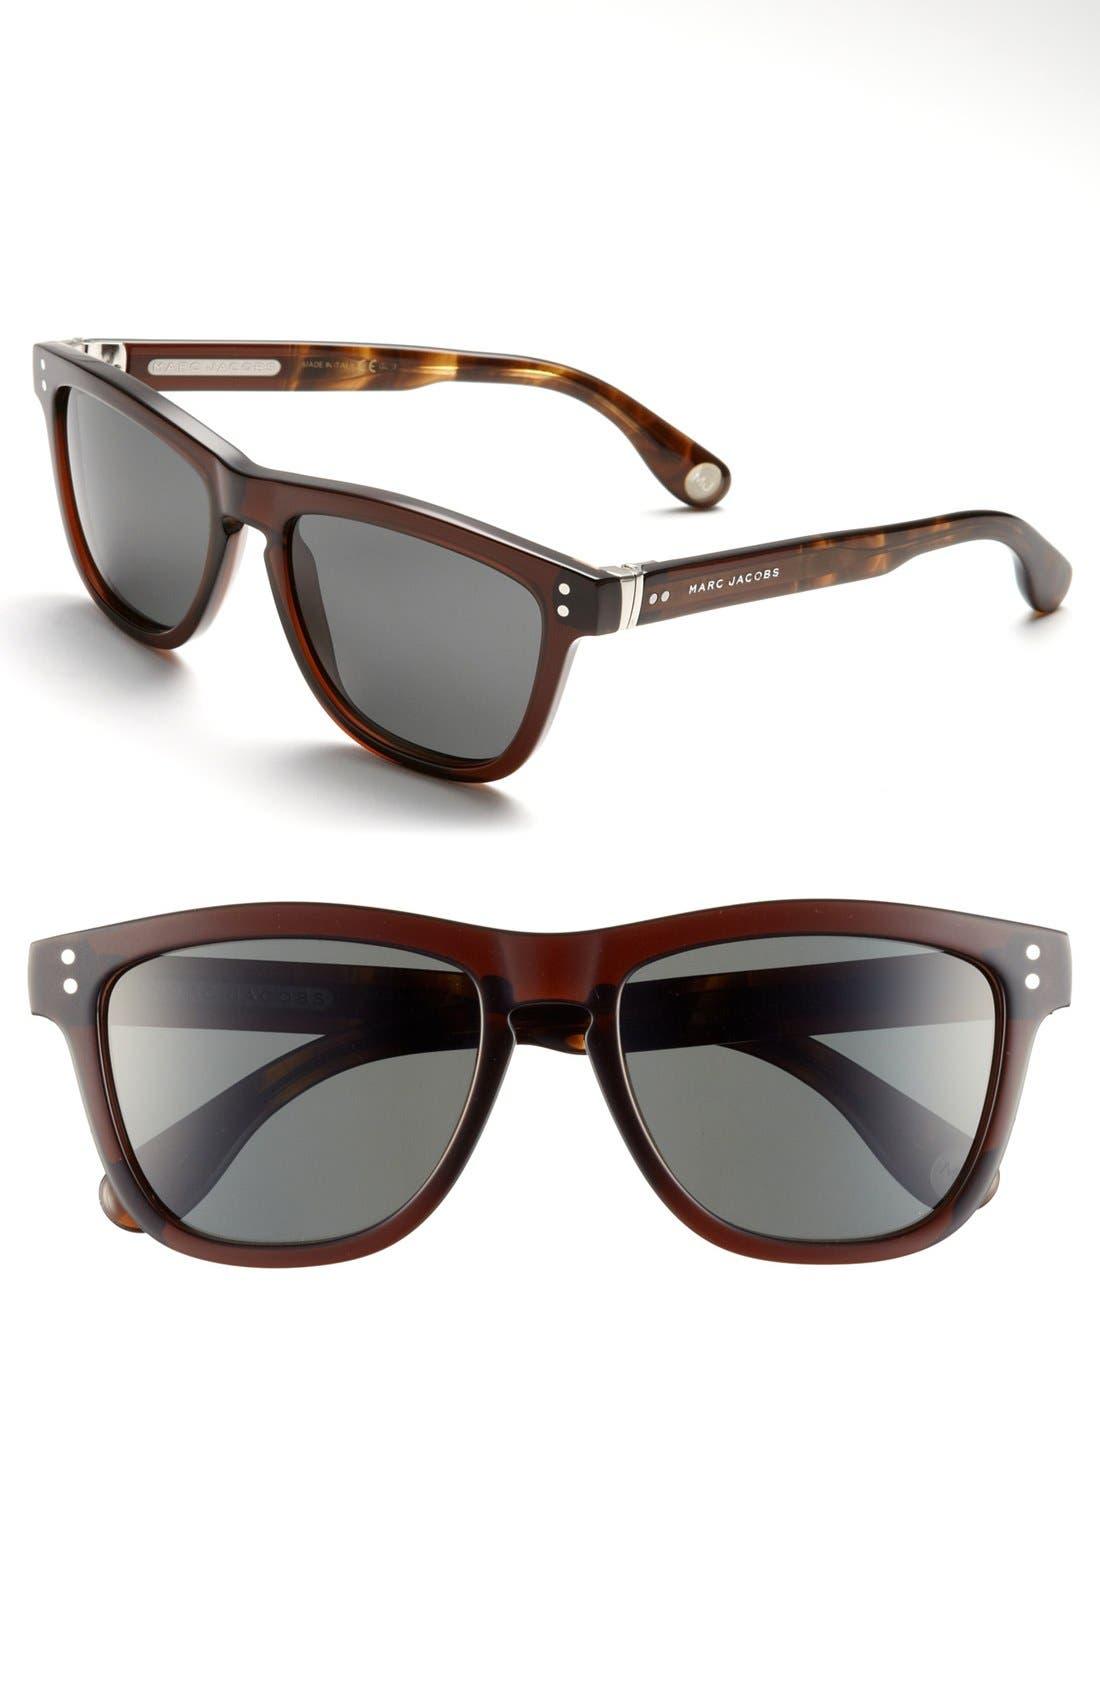 Main Image - MARC JACOBS 55mm Retro Sunglasses